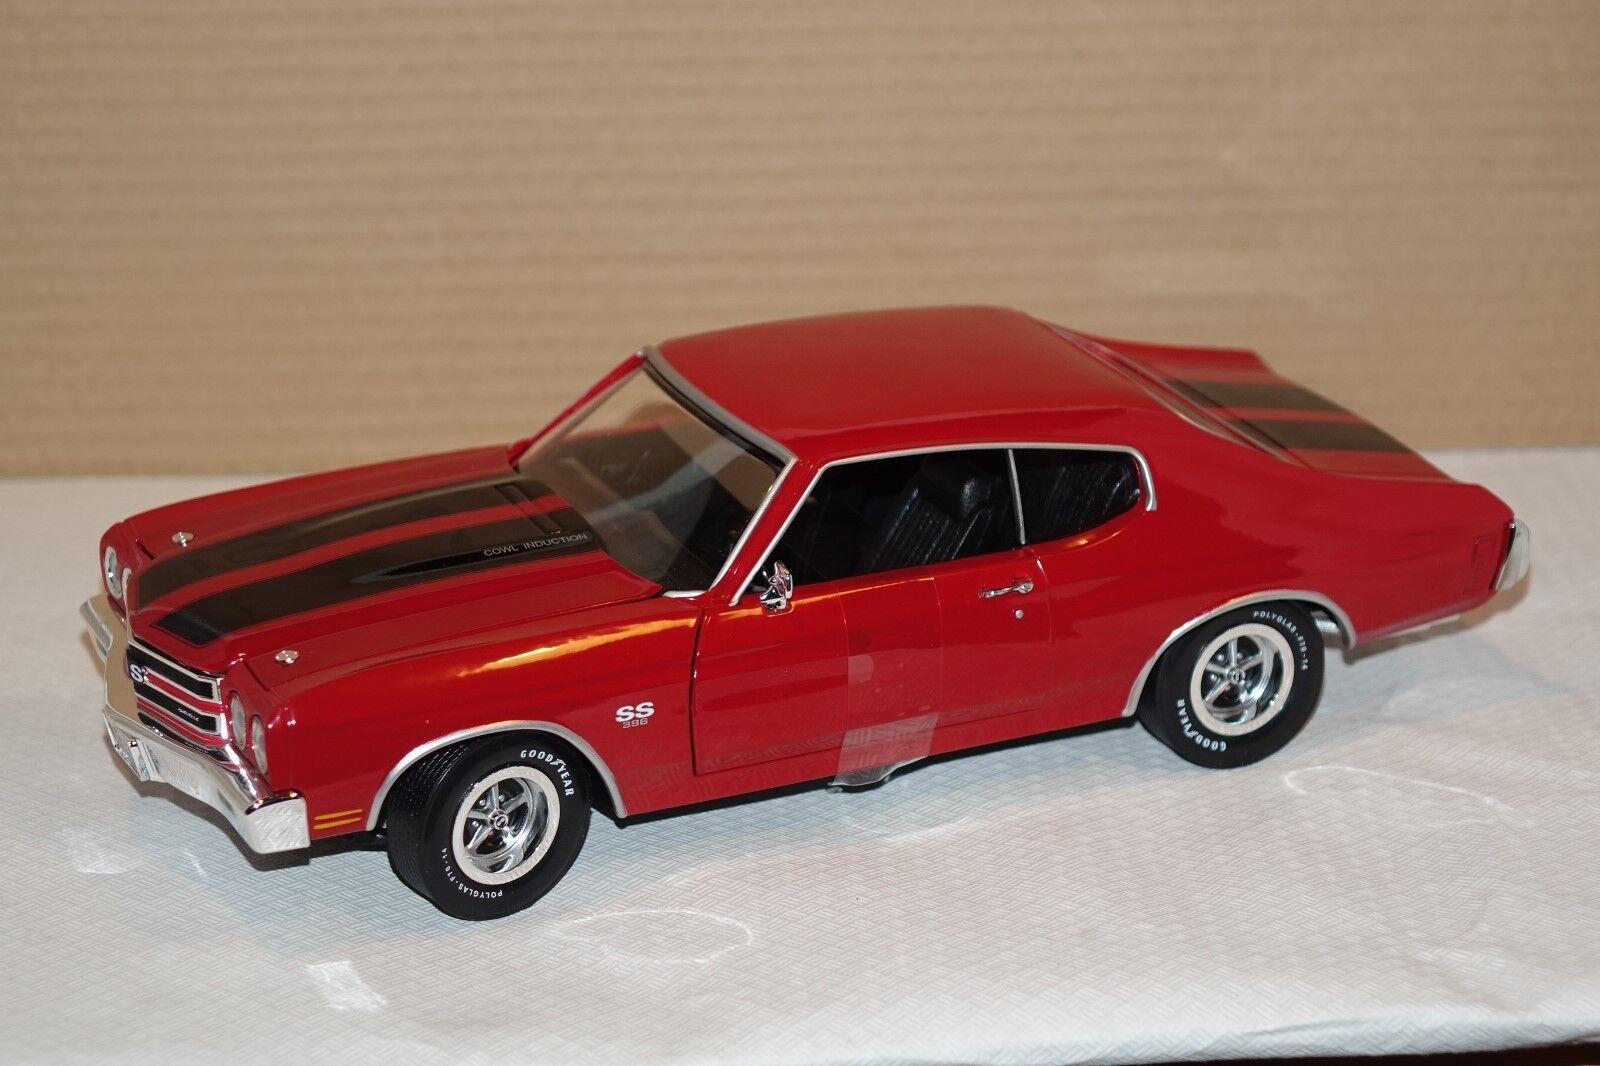 gran descuento Chevy Chevy Chevy Chevelle SS 396 rojo 1970 1 18 auto World amm1082 nuevo & OVP  entrega de rayos